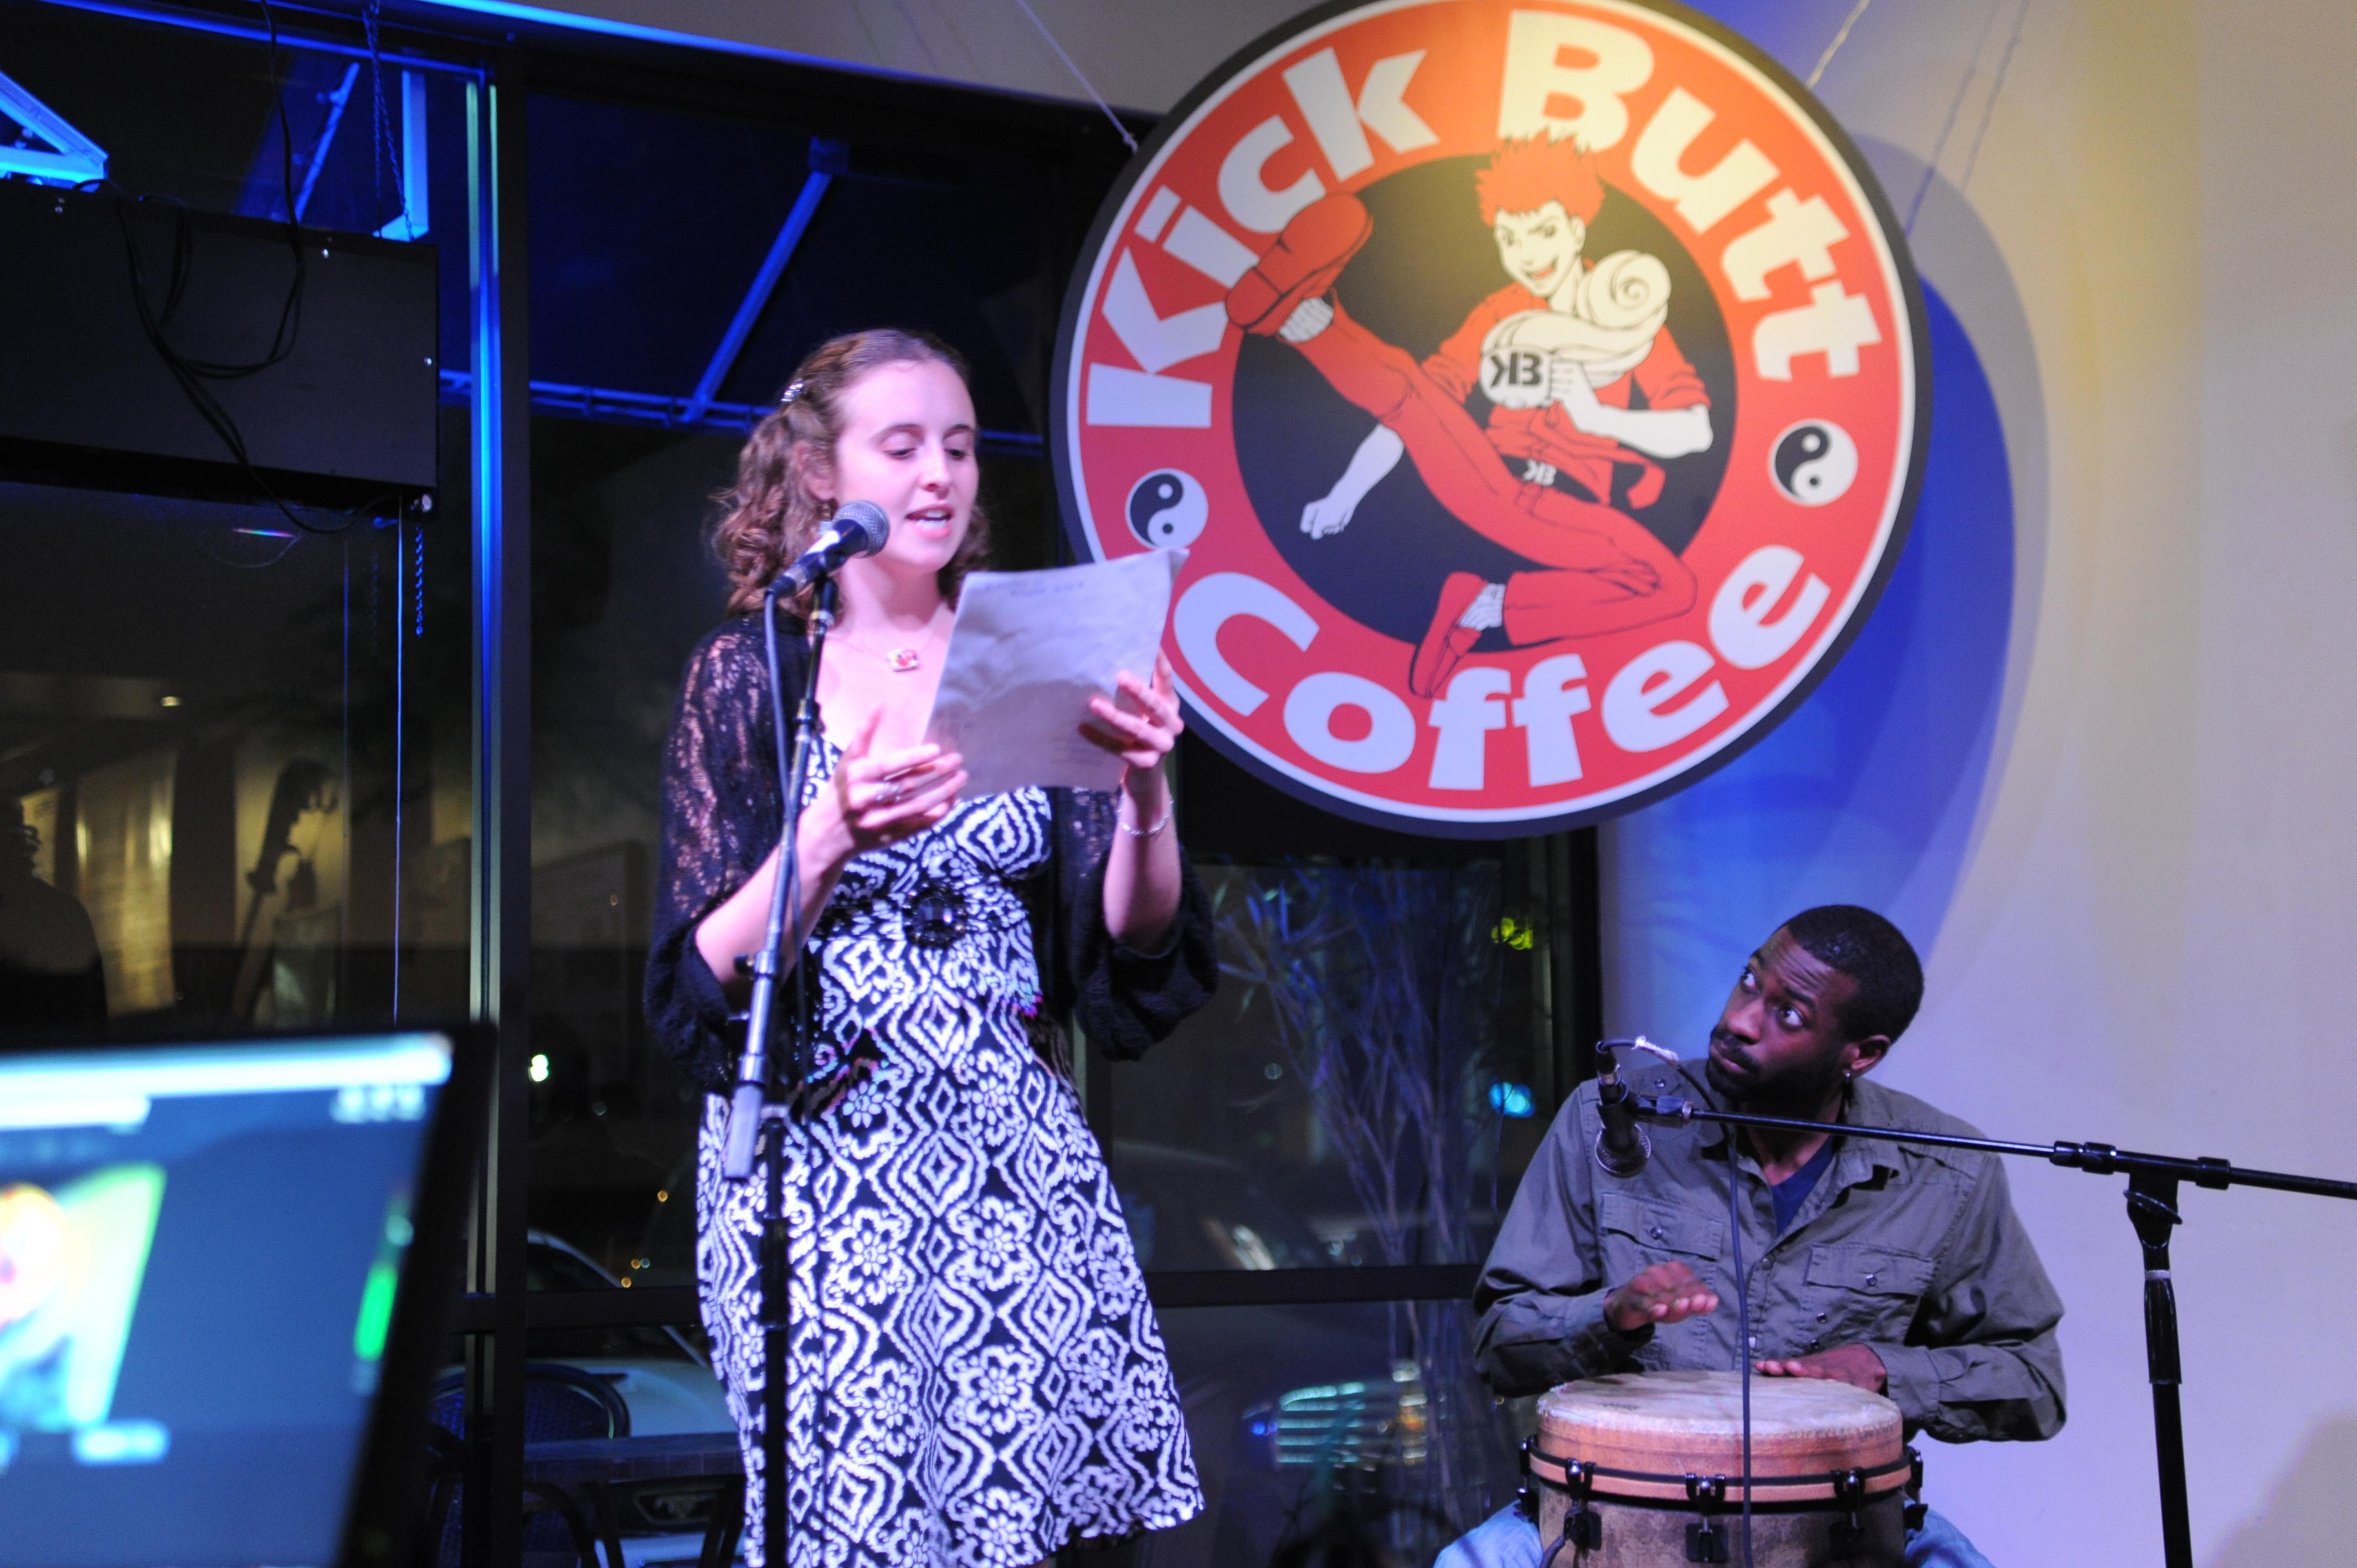 Featured Performer: Kickbutt Coffee